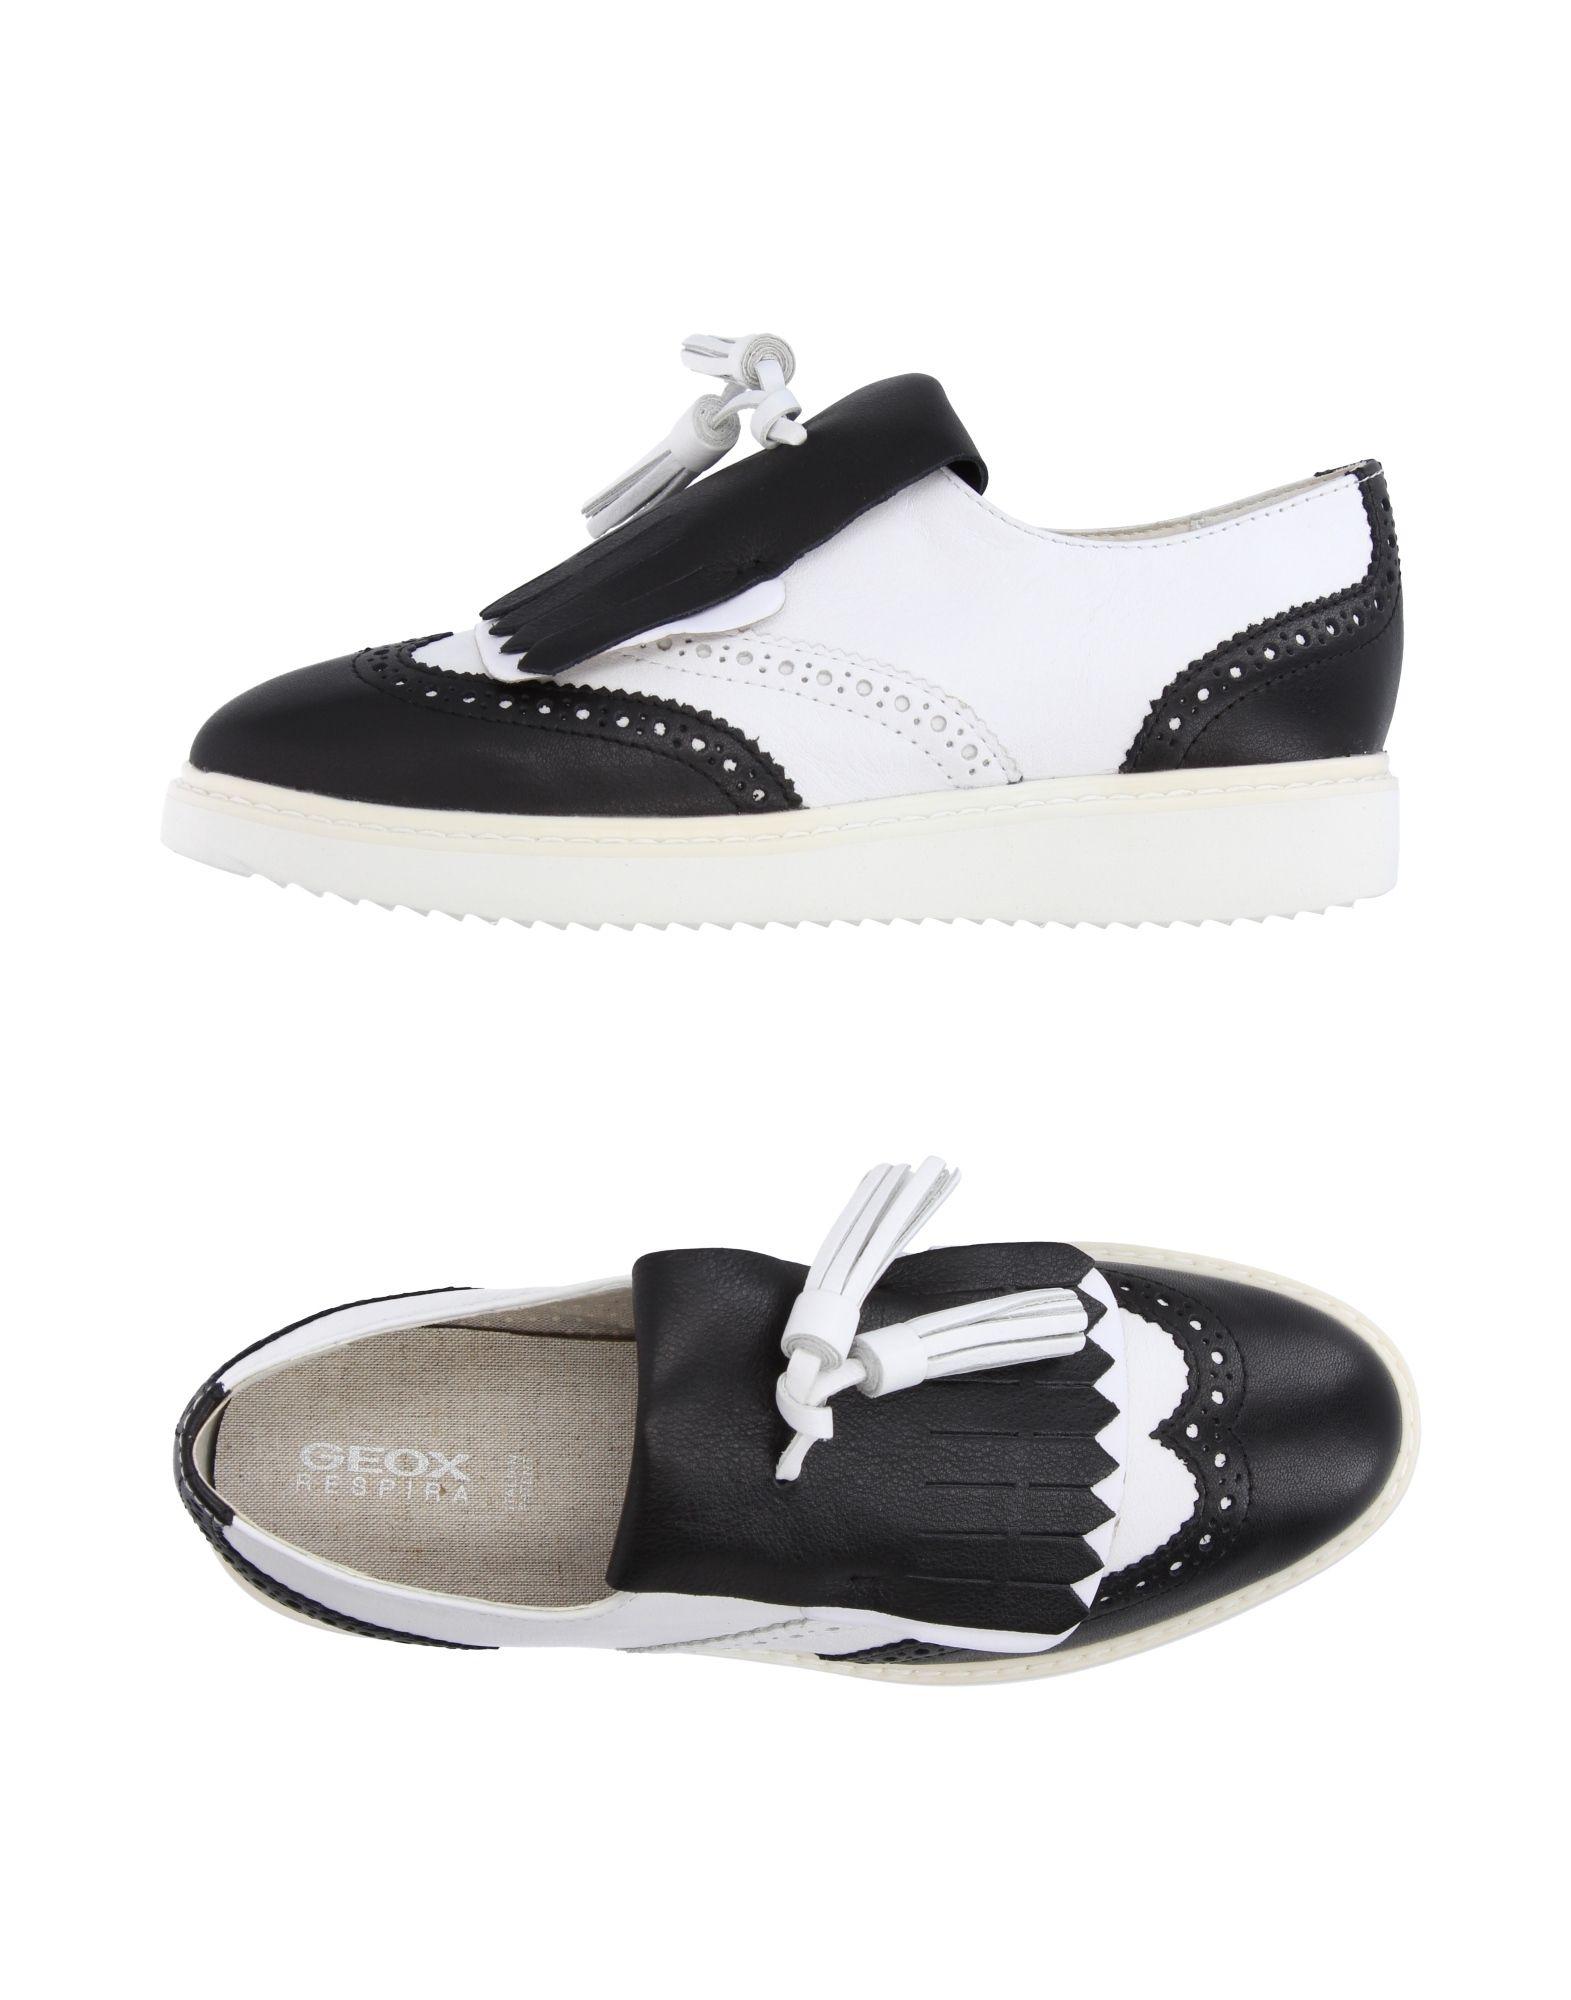 Geox Mokassins Damen  11217847UW Gute Qualität beliebte Schuhe